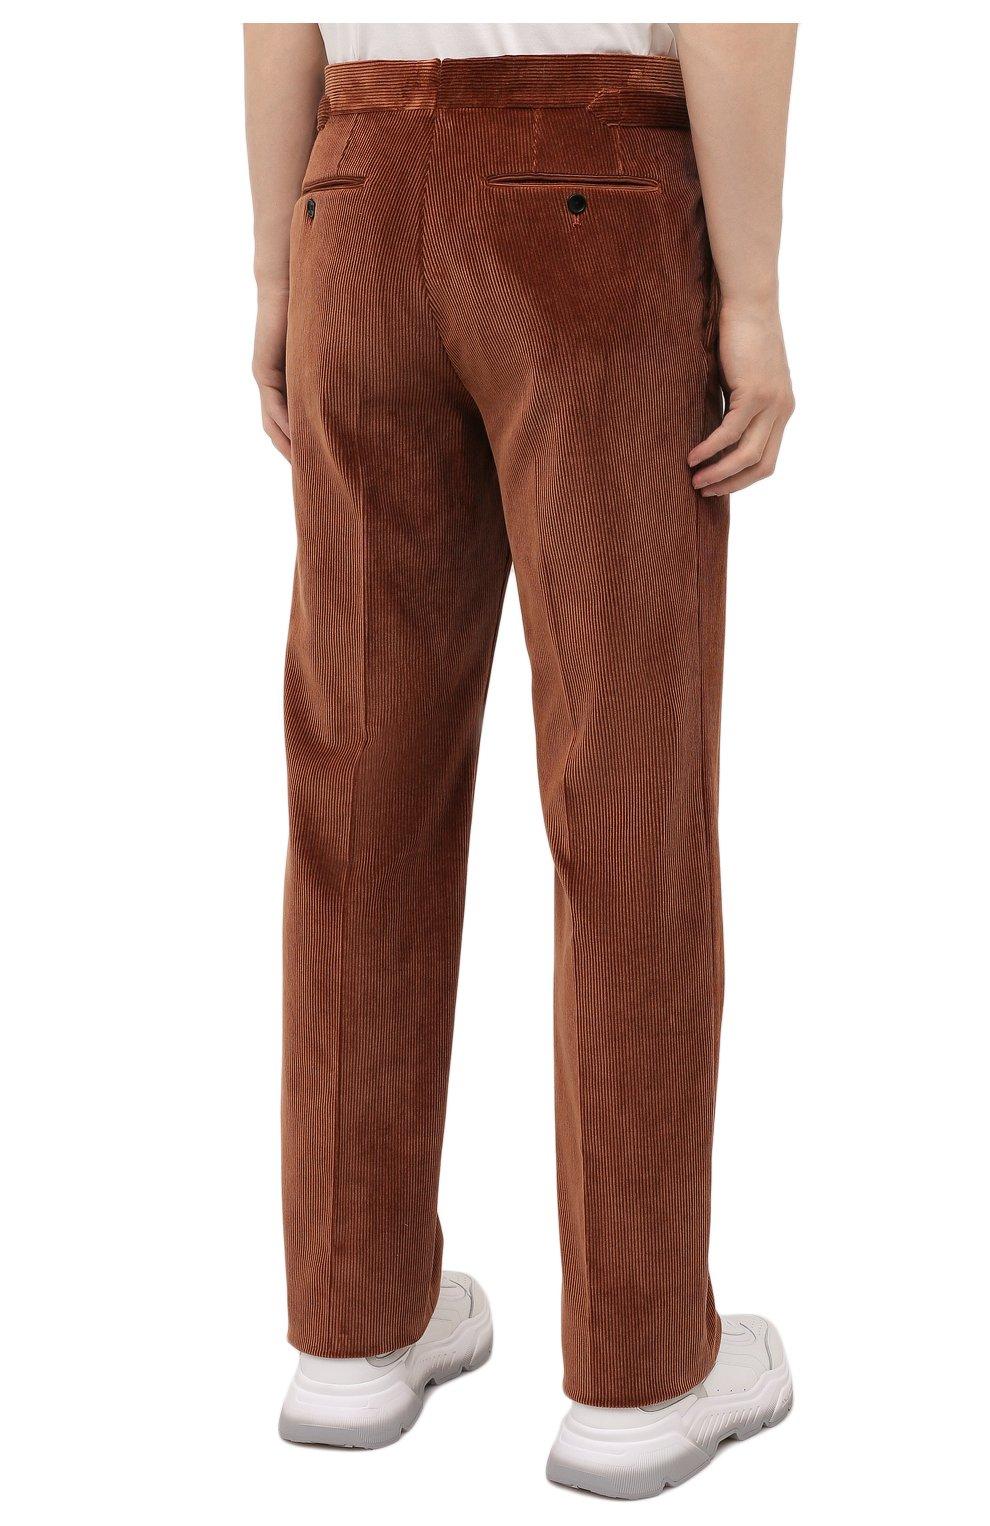 Мужские брюки TOM FORD коричневого цвета, арт. 2VER24/610041 | Фото 4